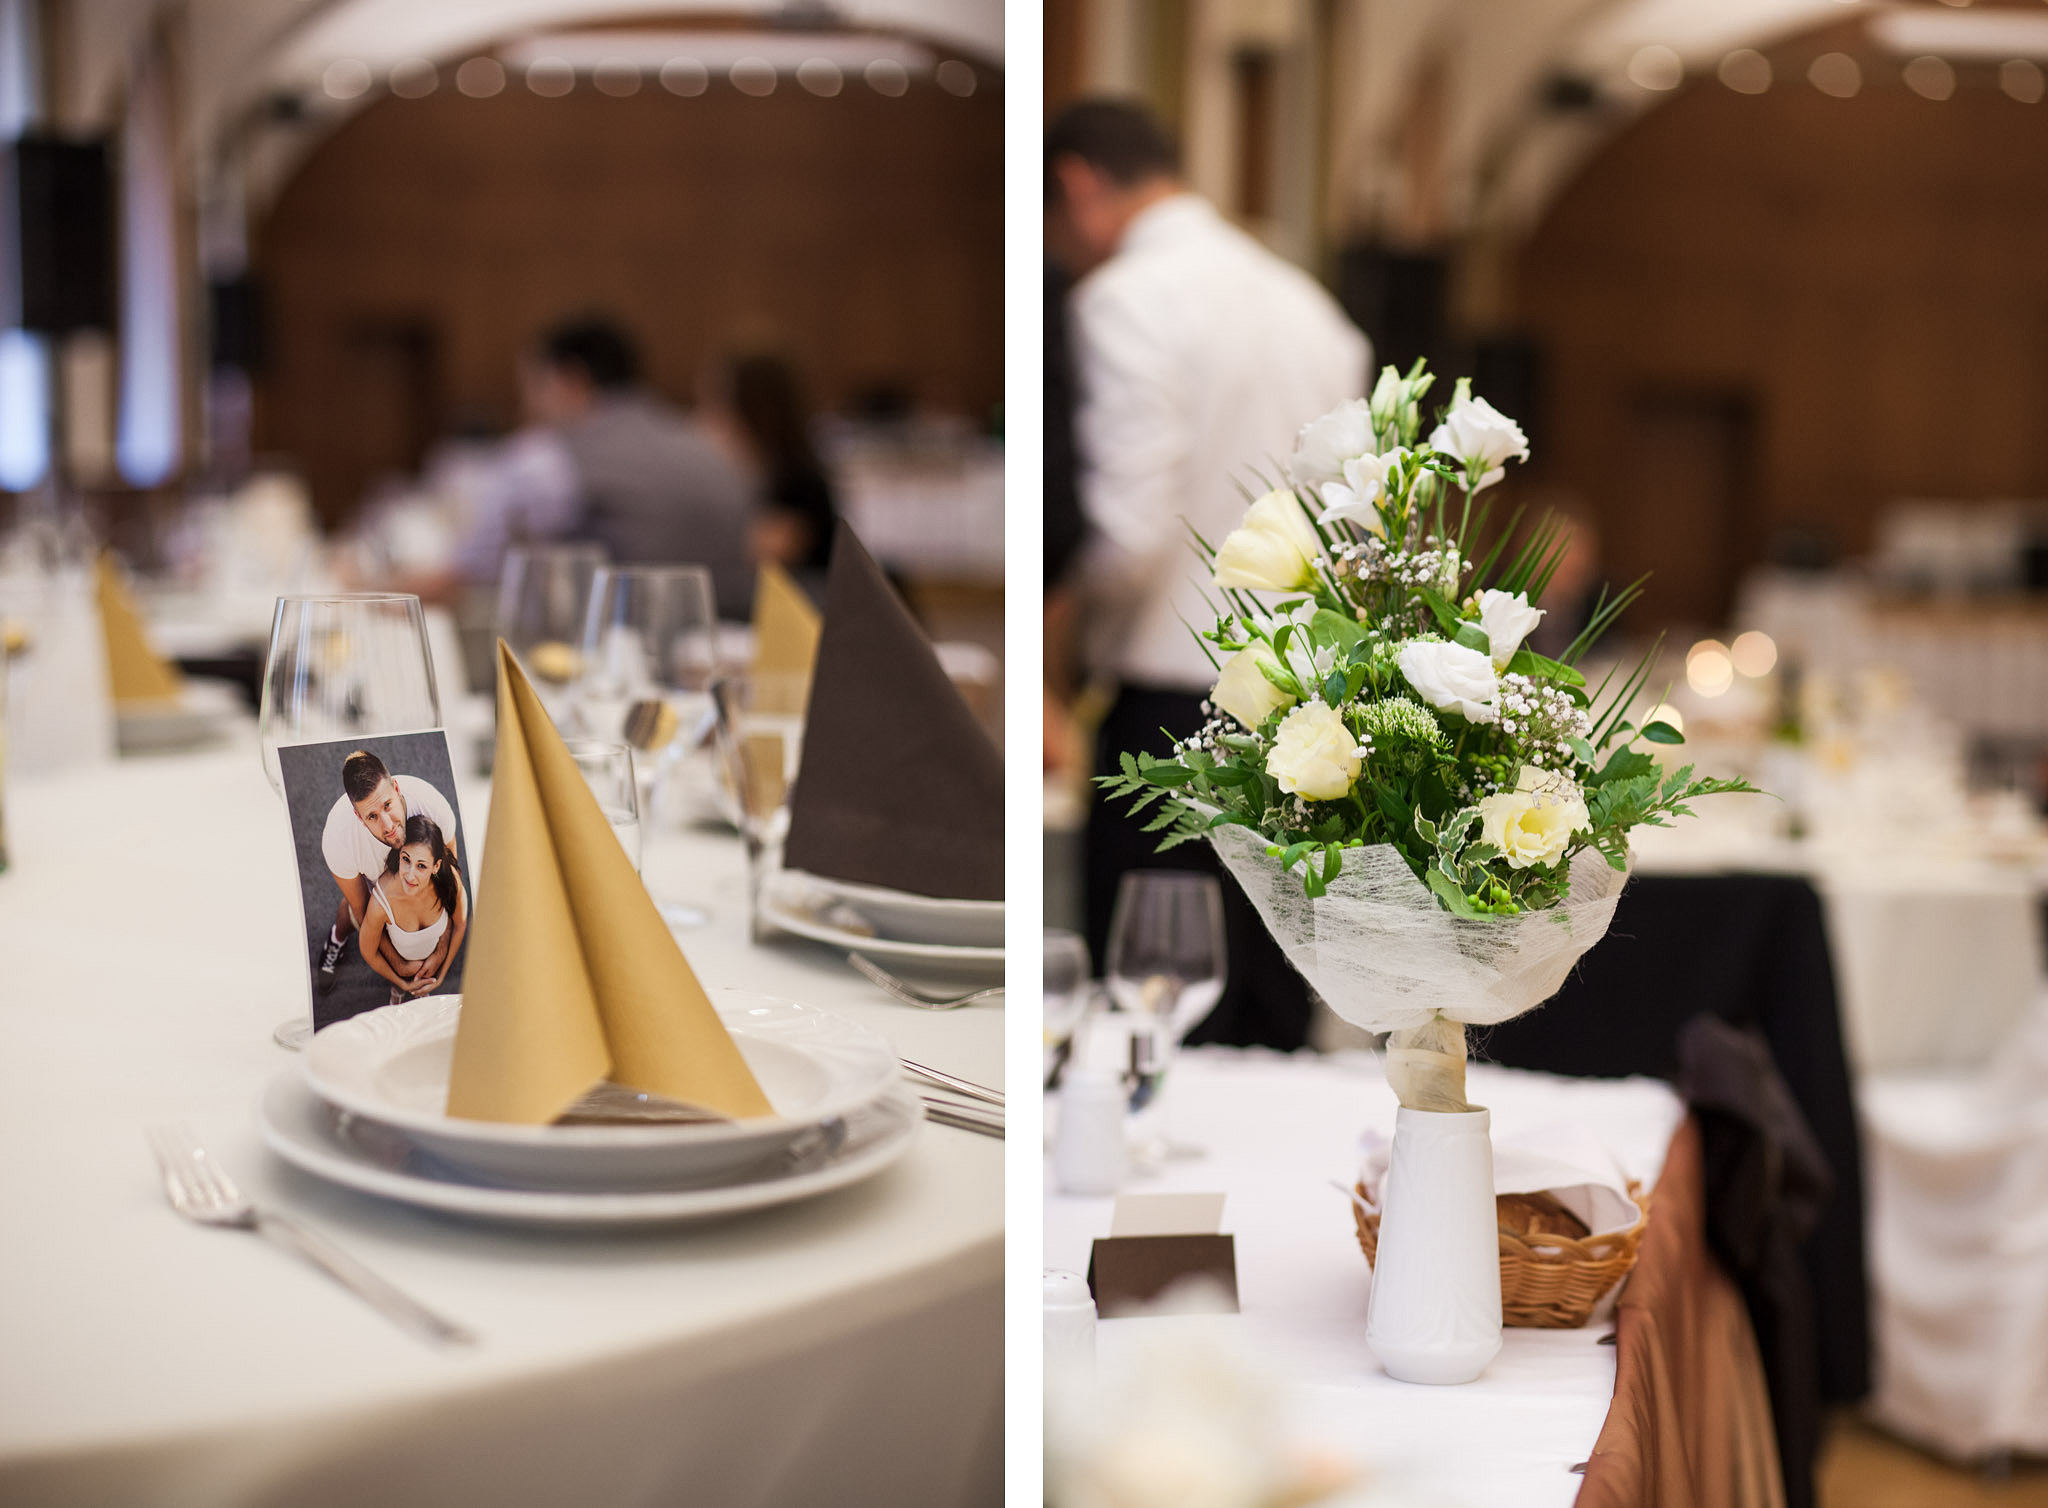 eskuvo_fotozas_wedding_foto_lenart_gabor_sztyui_budapest_esztergom_IMG_5274